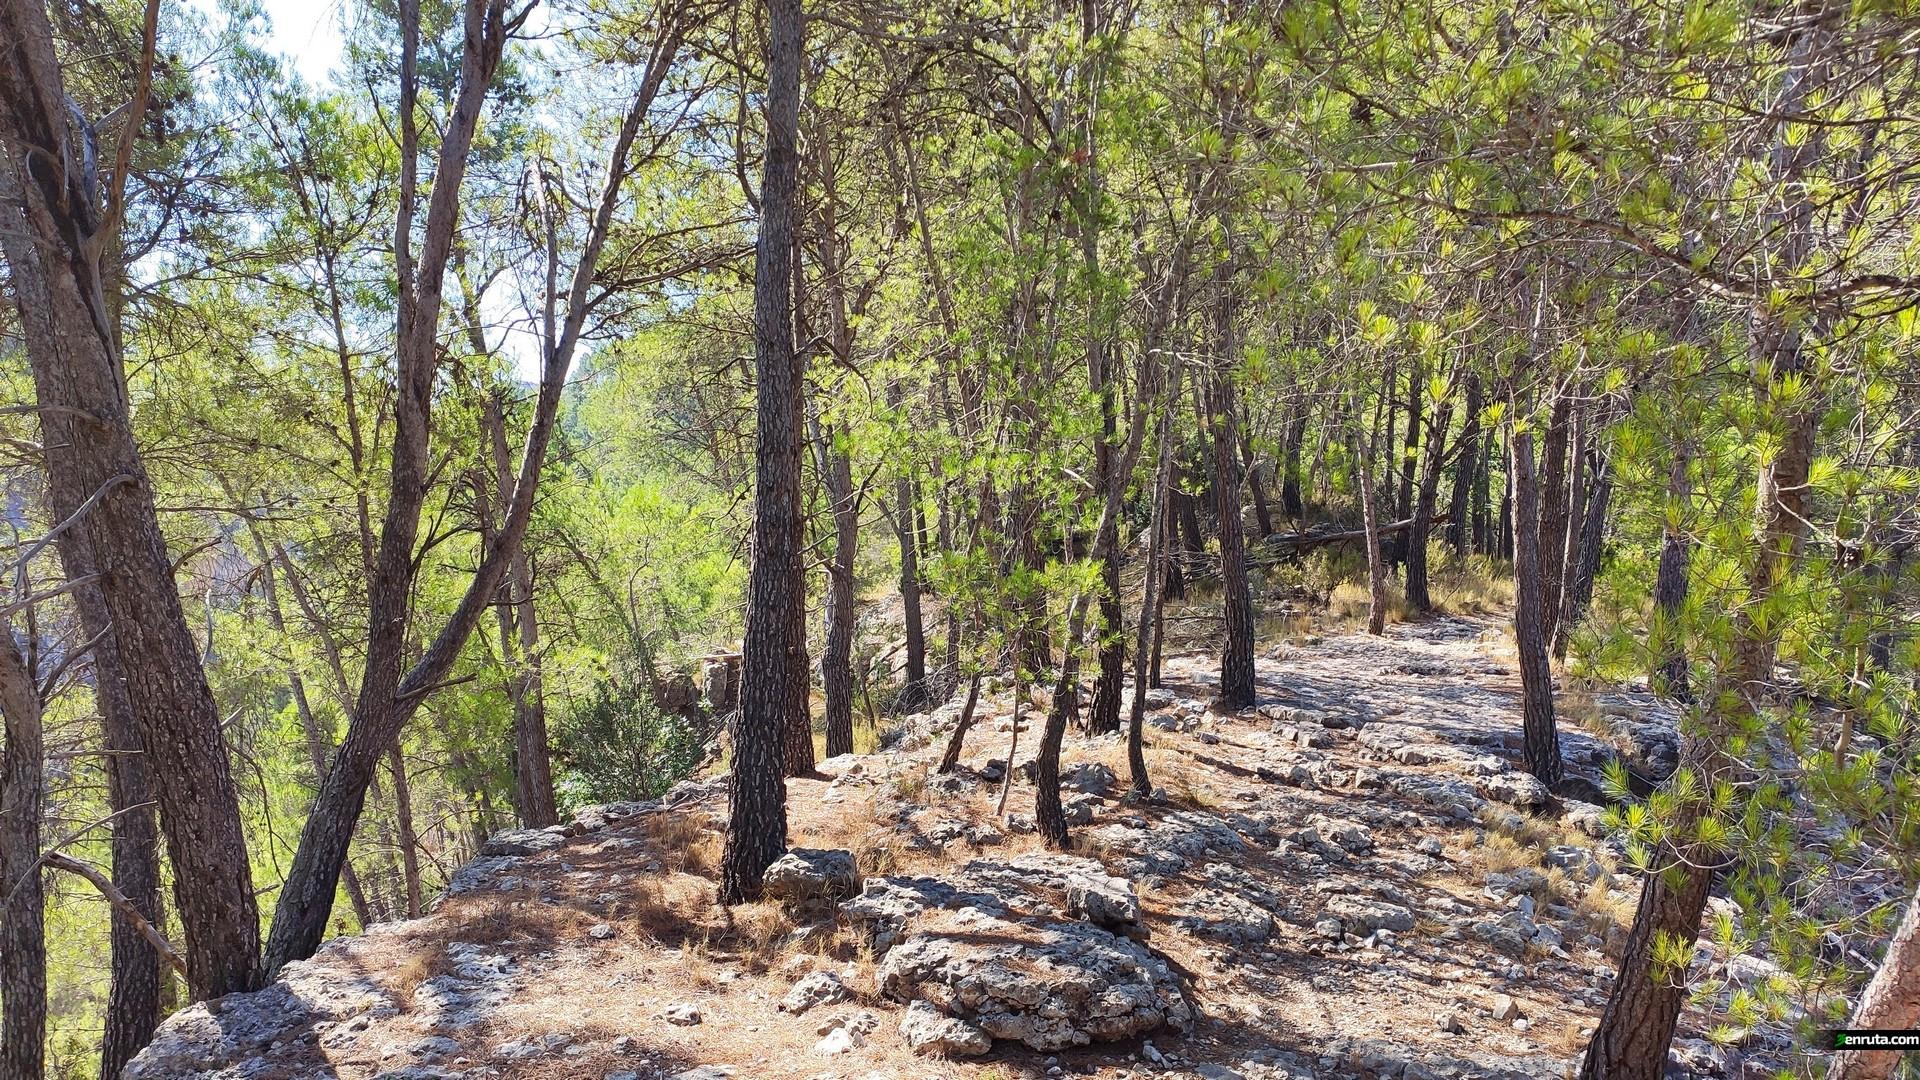 La ruta transcurre por un tramo rocoso